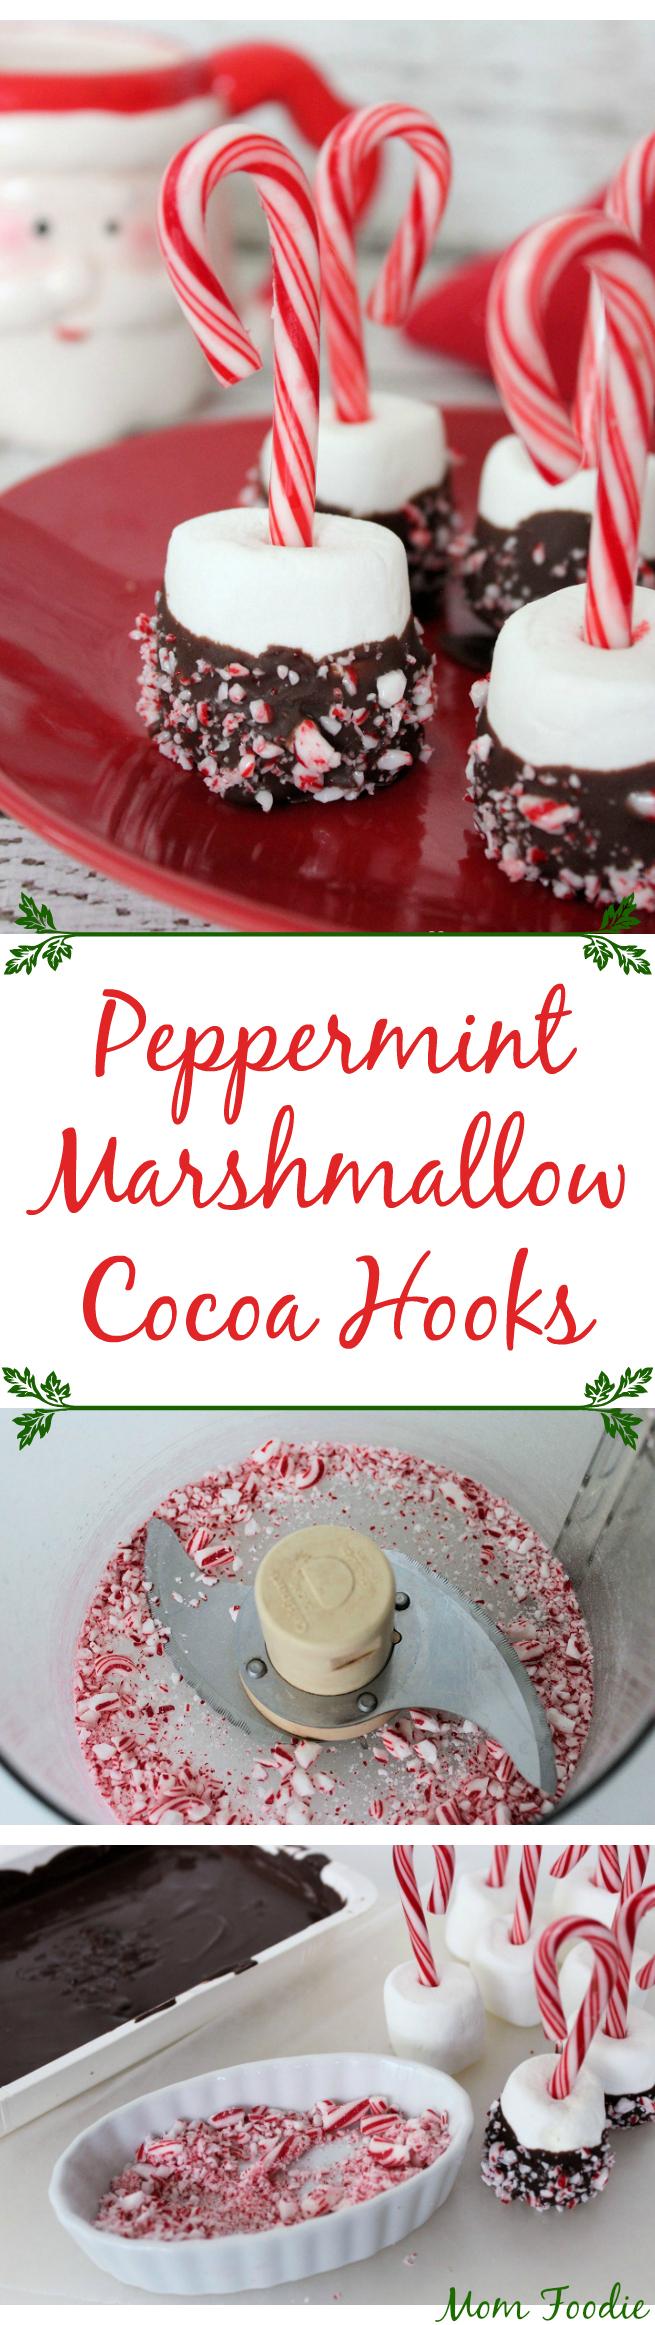 peppermint marshmallow cocoa hooks